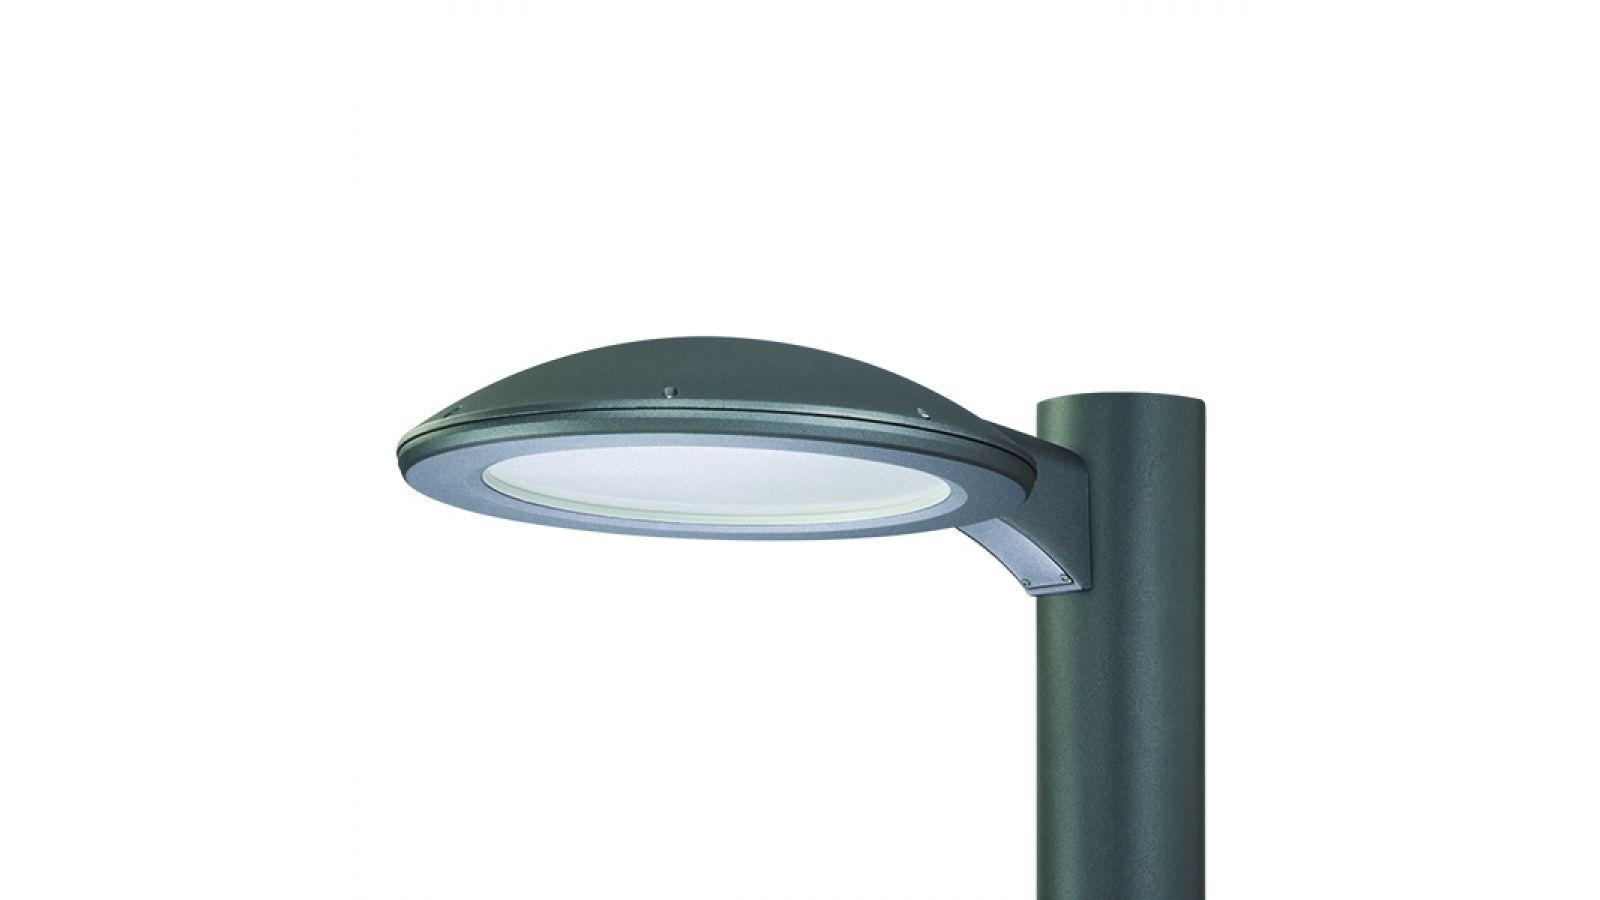 McGraw-Edison TopTier™ Area/Site LED Post Top Luminaire